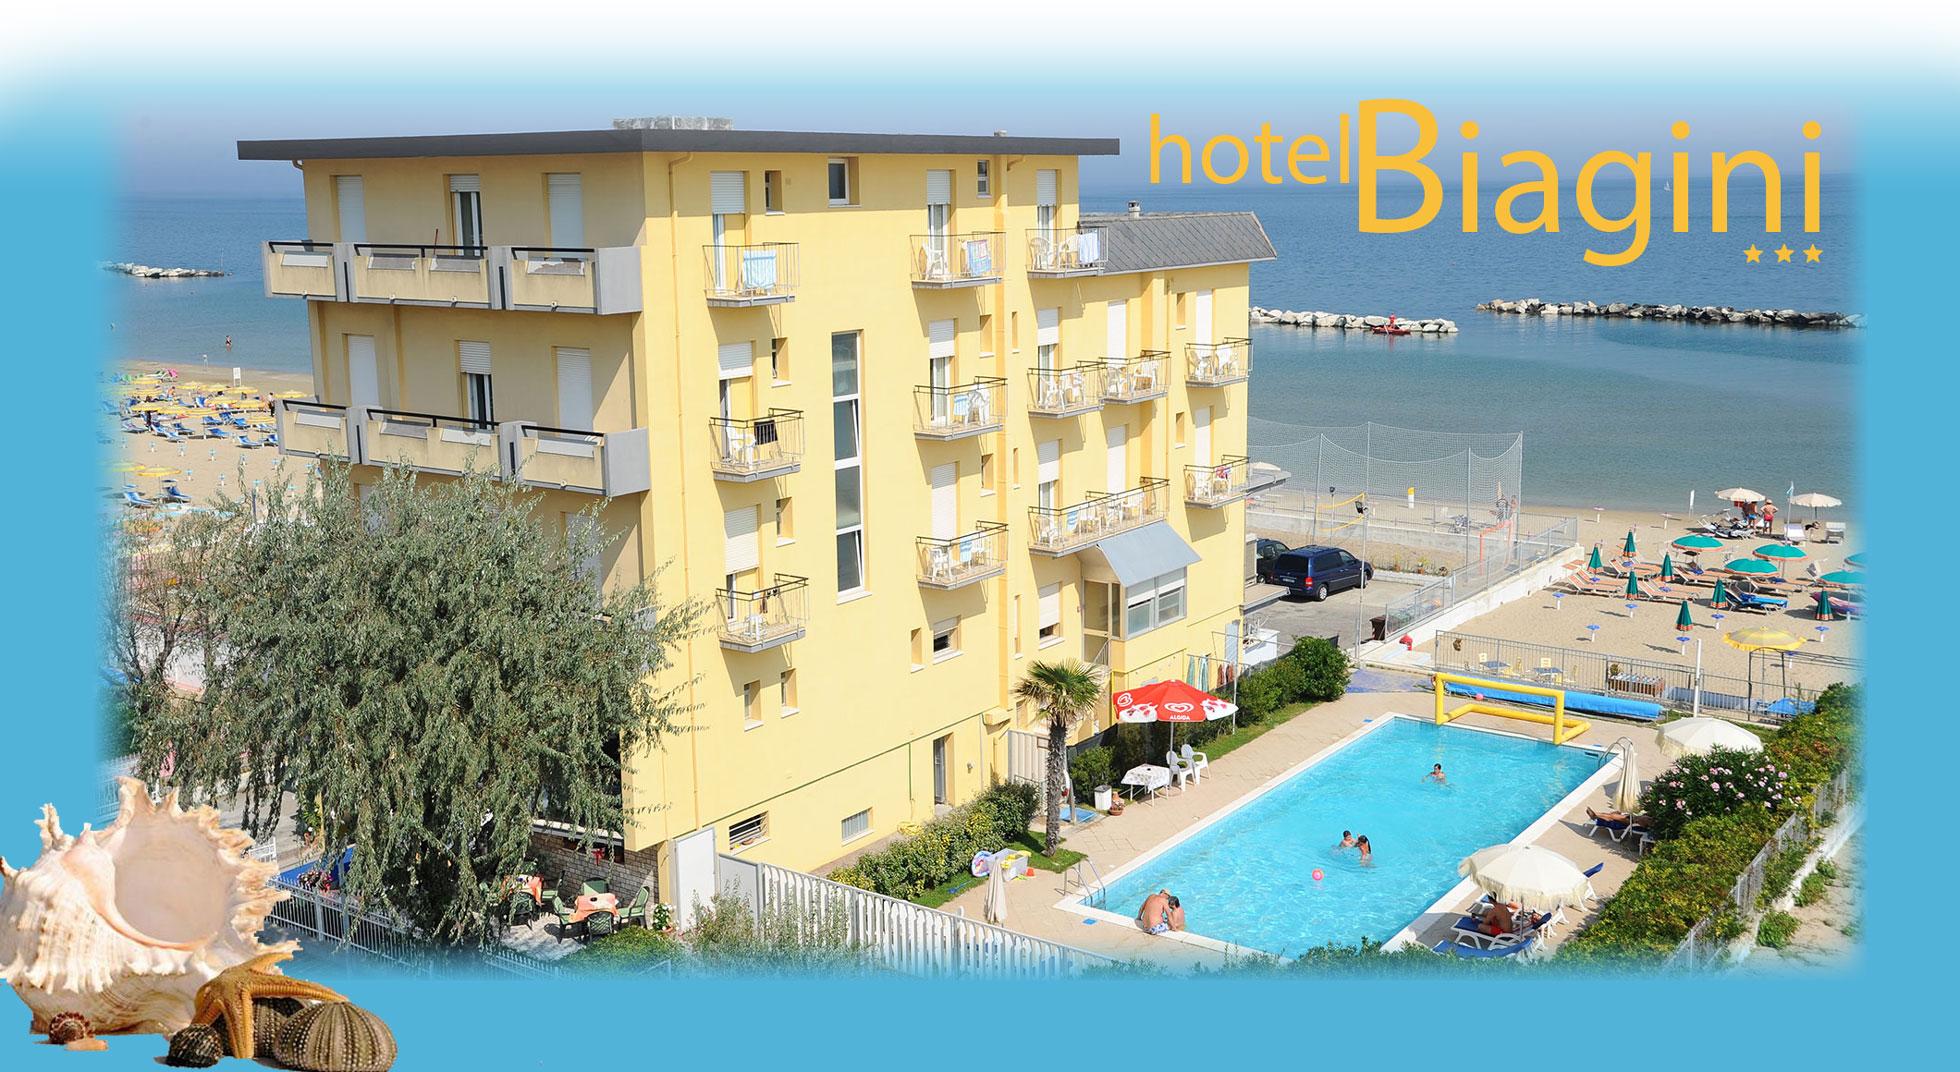 hotel-biagini-cover